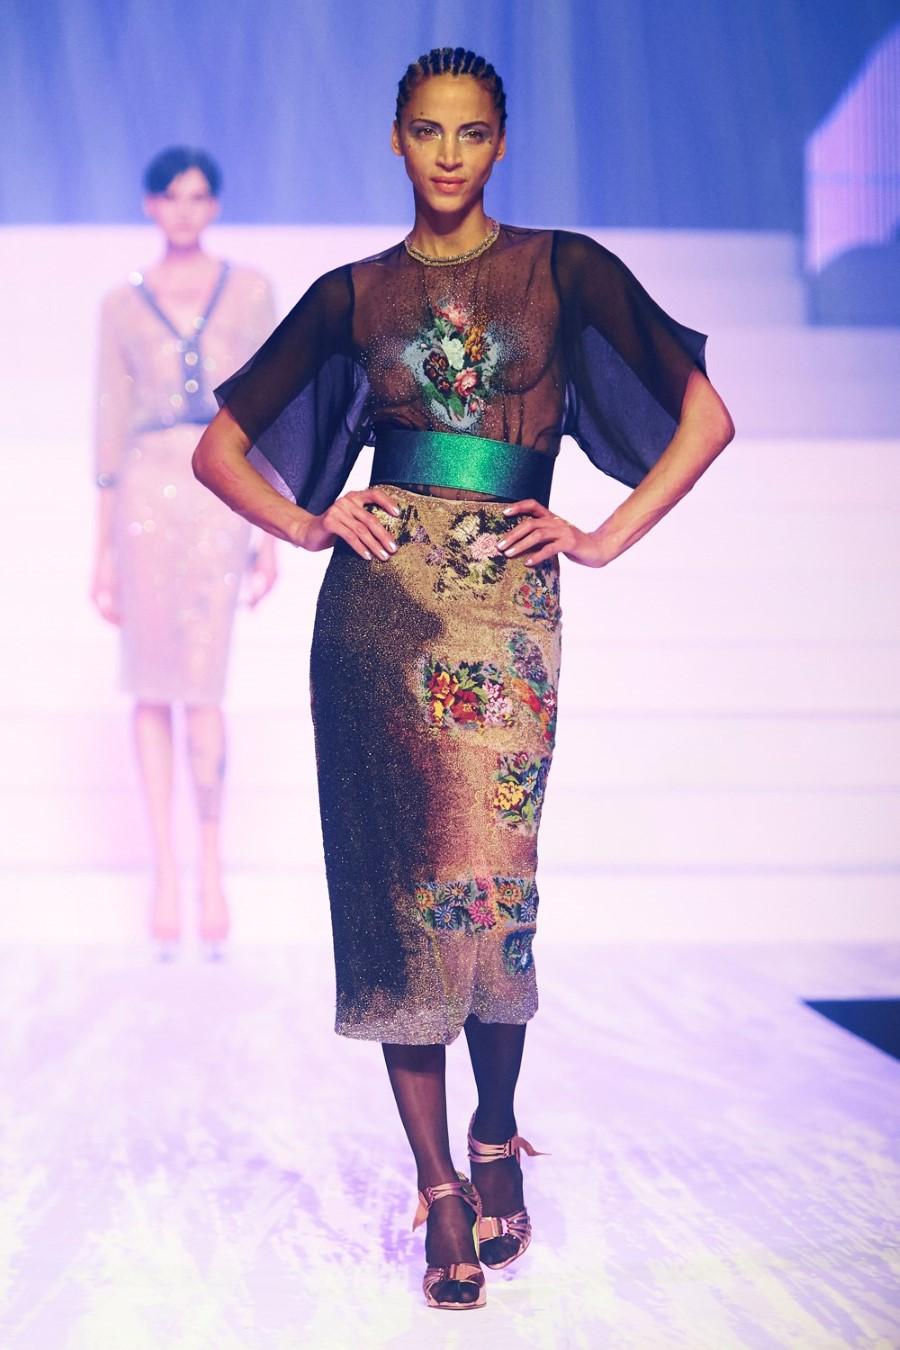 Jean Paul Gaultier Haute Couture Spring/Summer 2020